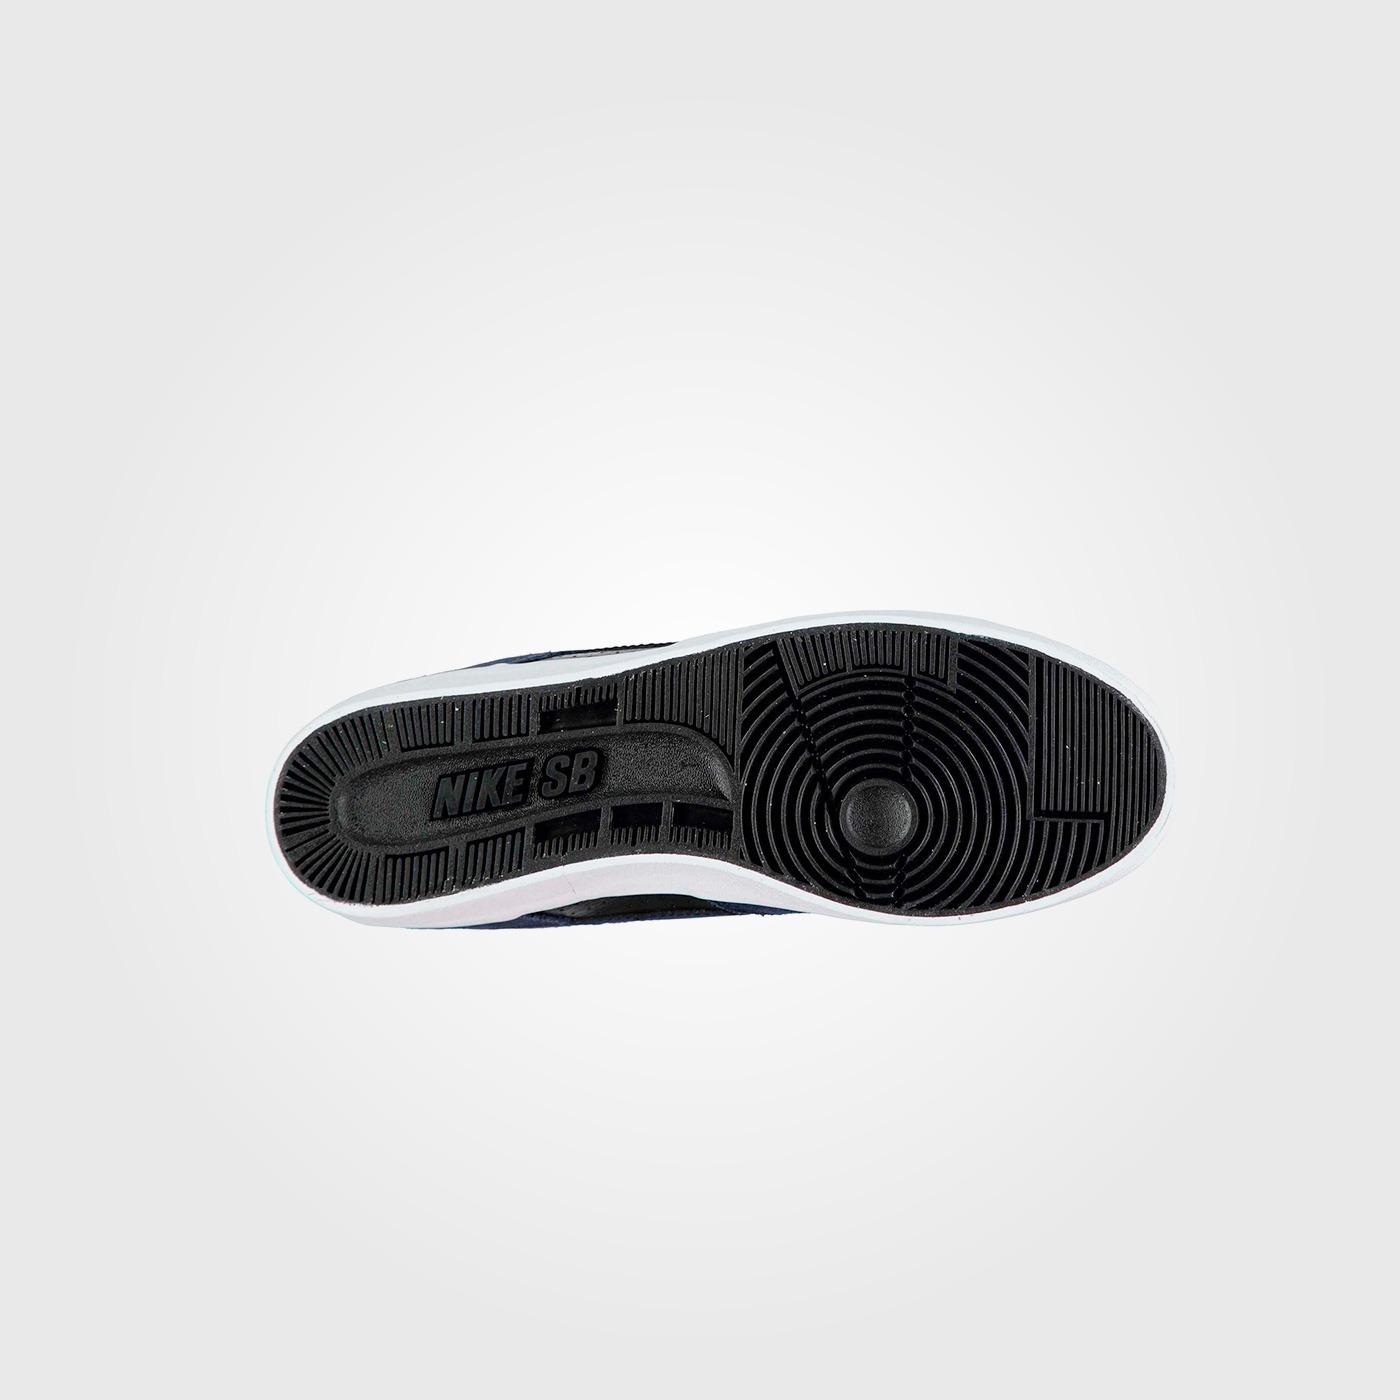 Кроссовки Nike Skateboard Delta Force Mens Skate Navy/Black